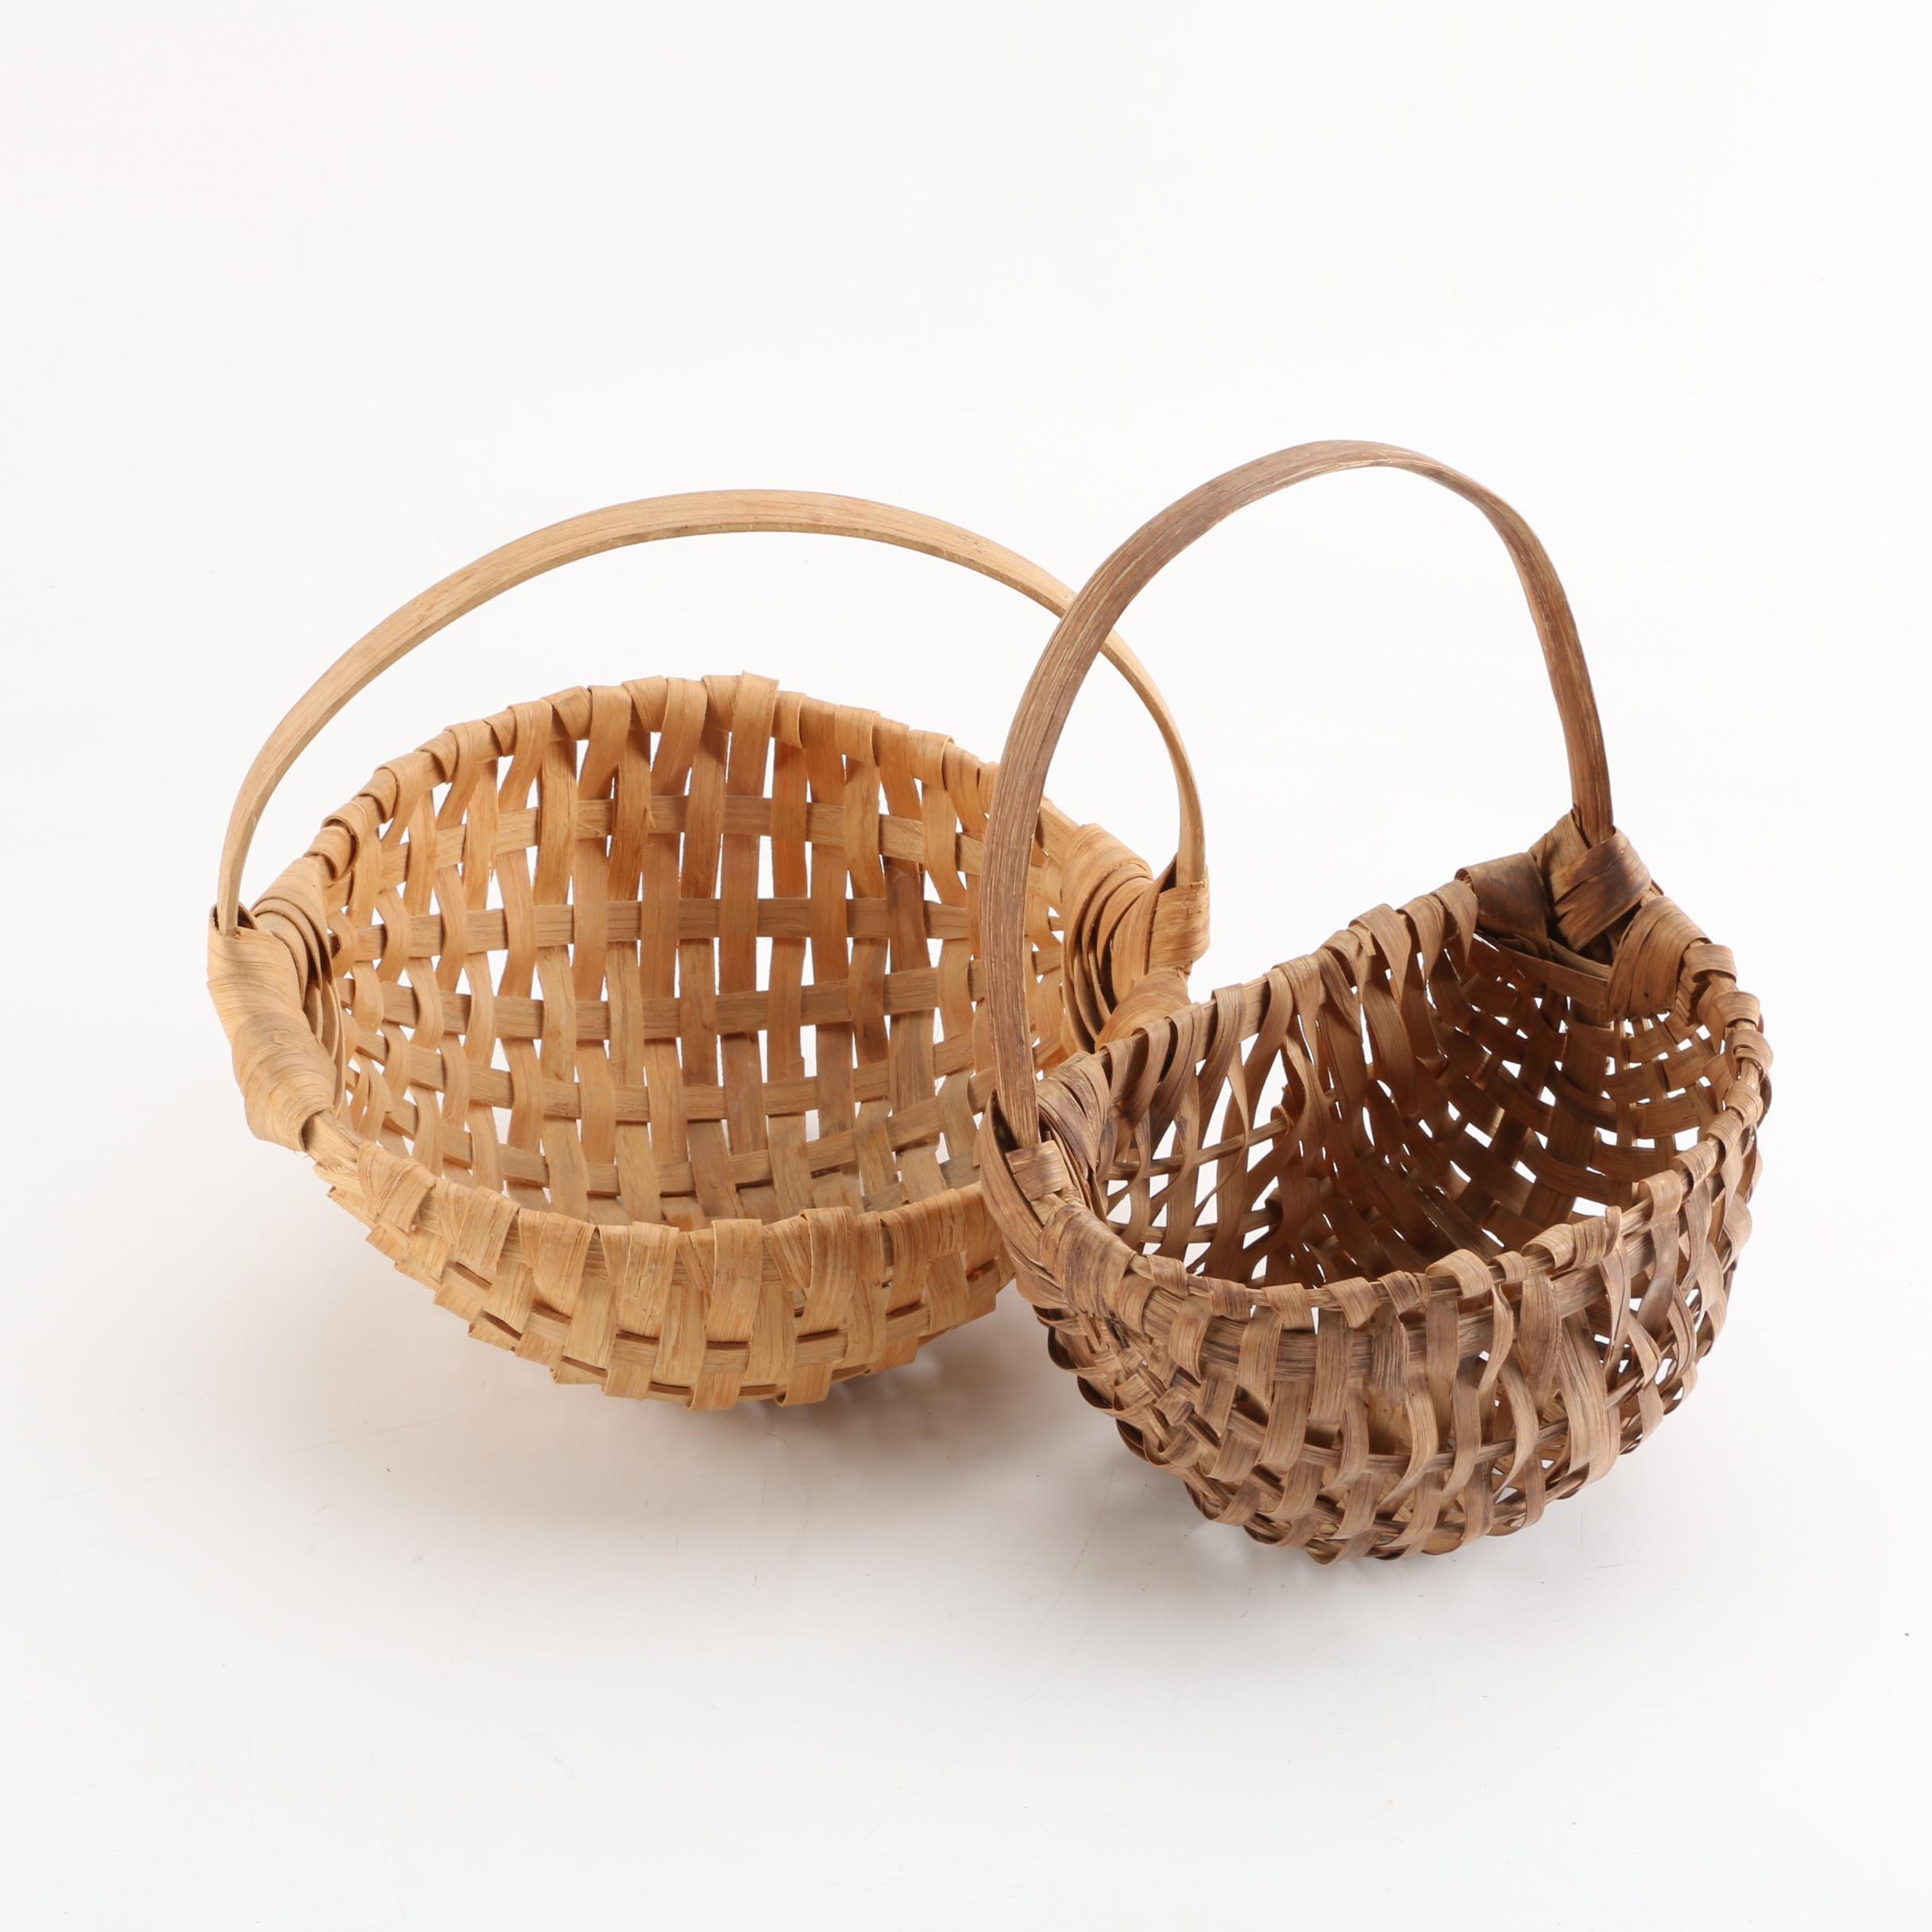 Vintage Handled Woven Baskets